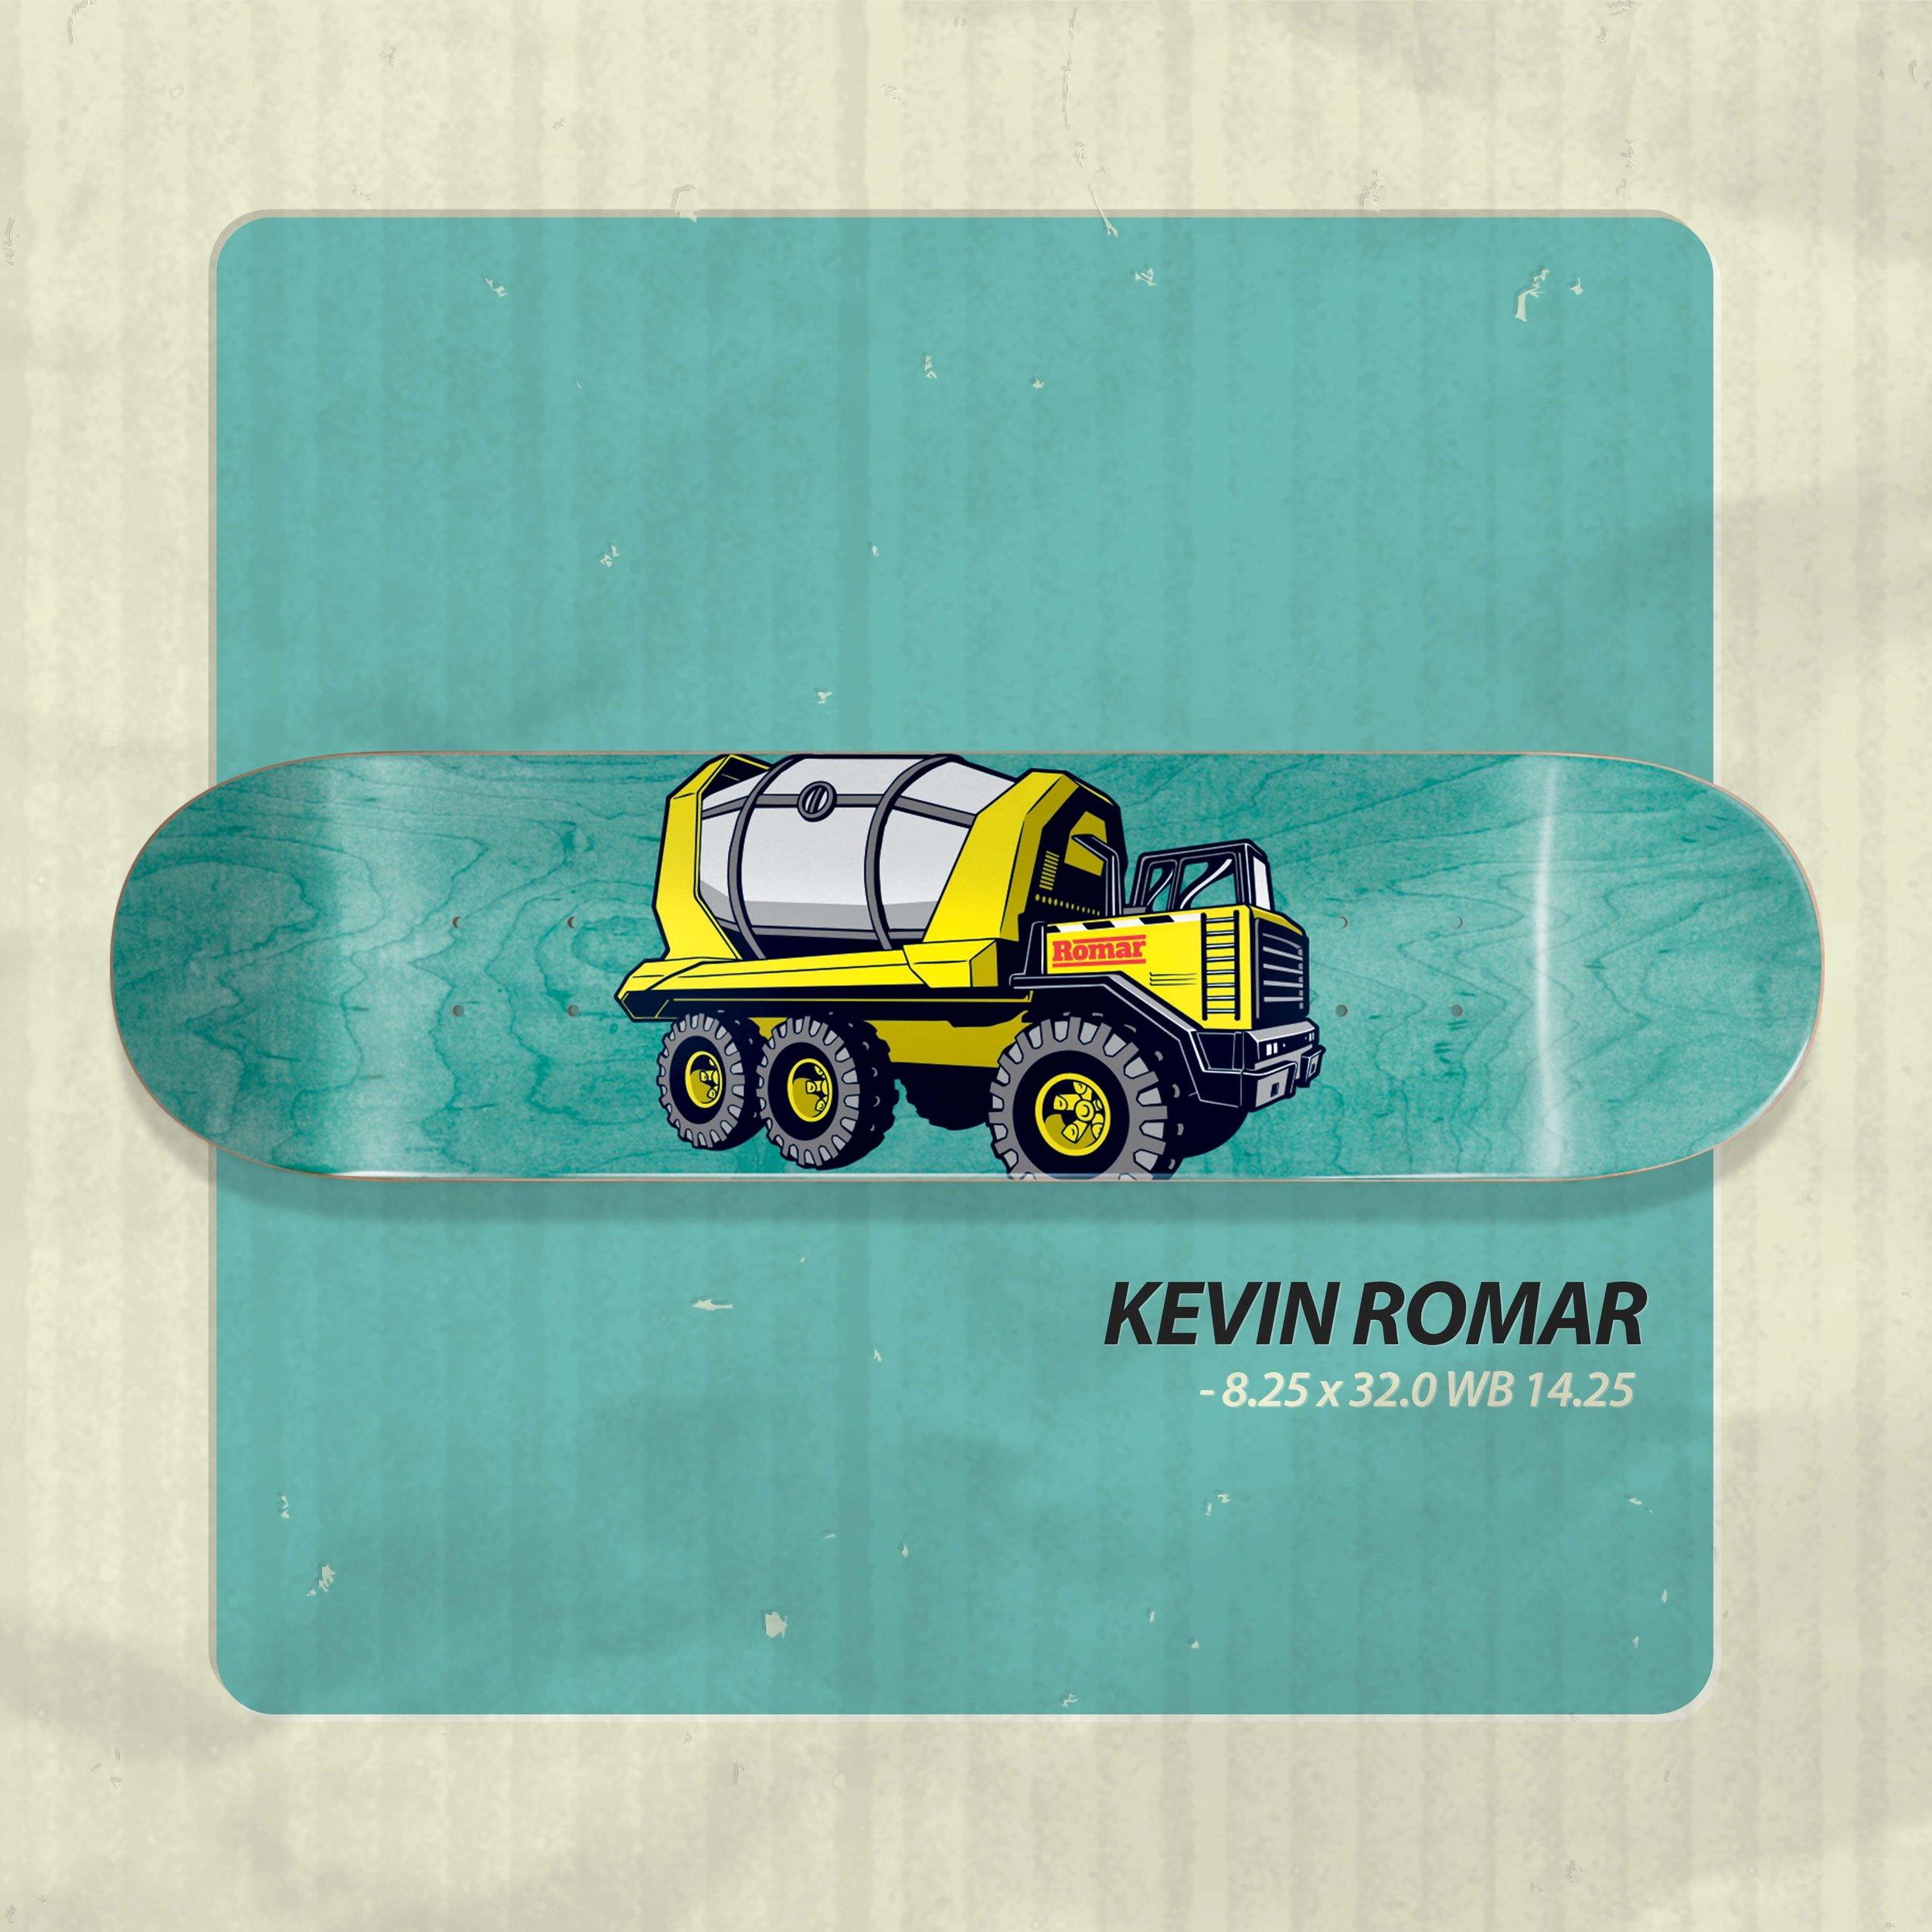 Trucks_Romar_1080x1080.jpg